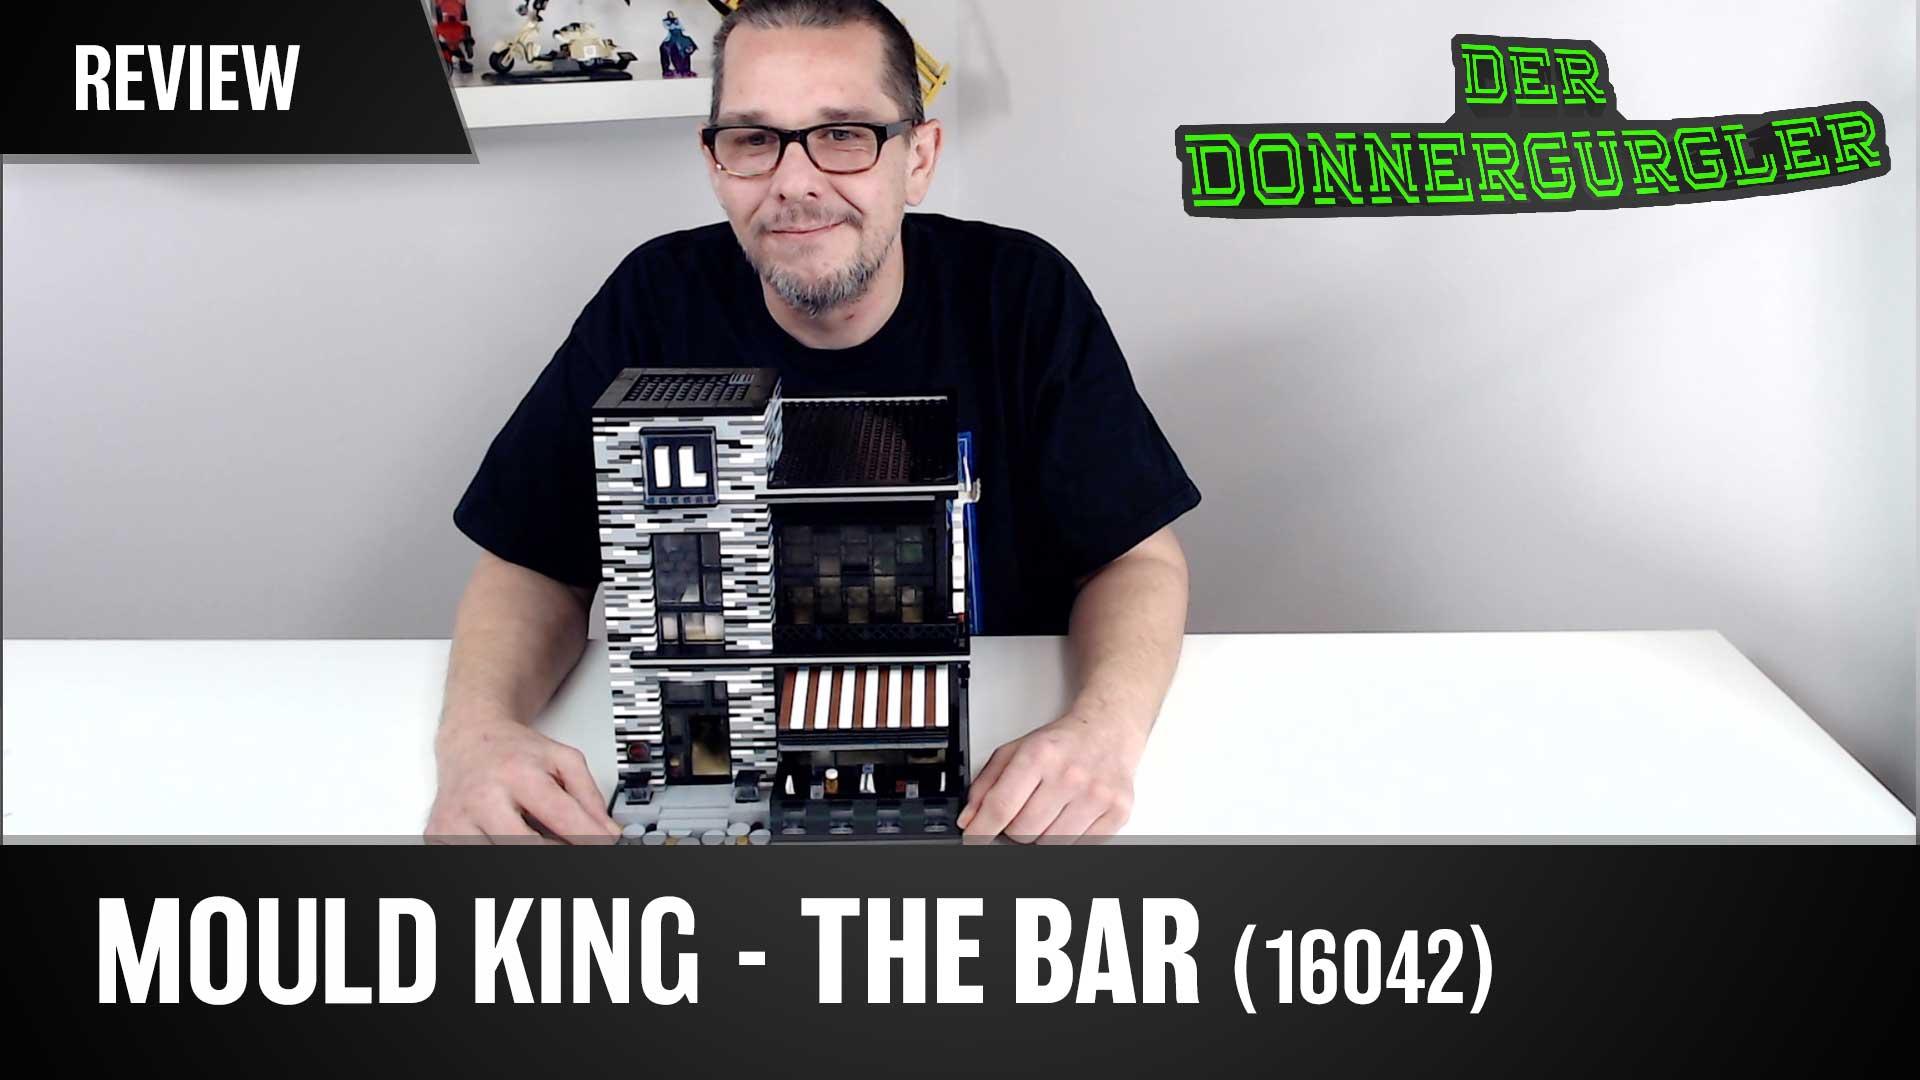 Mould King - THE BAR aus der Novatown Reihe (16042) mit LED Beleuchtung